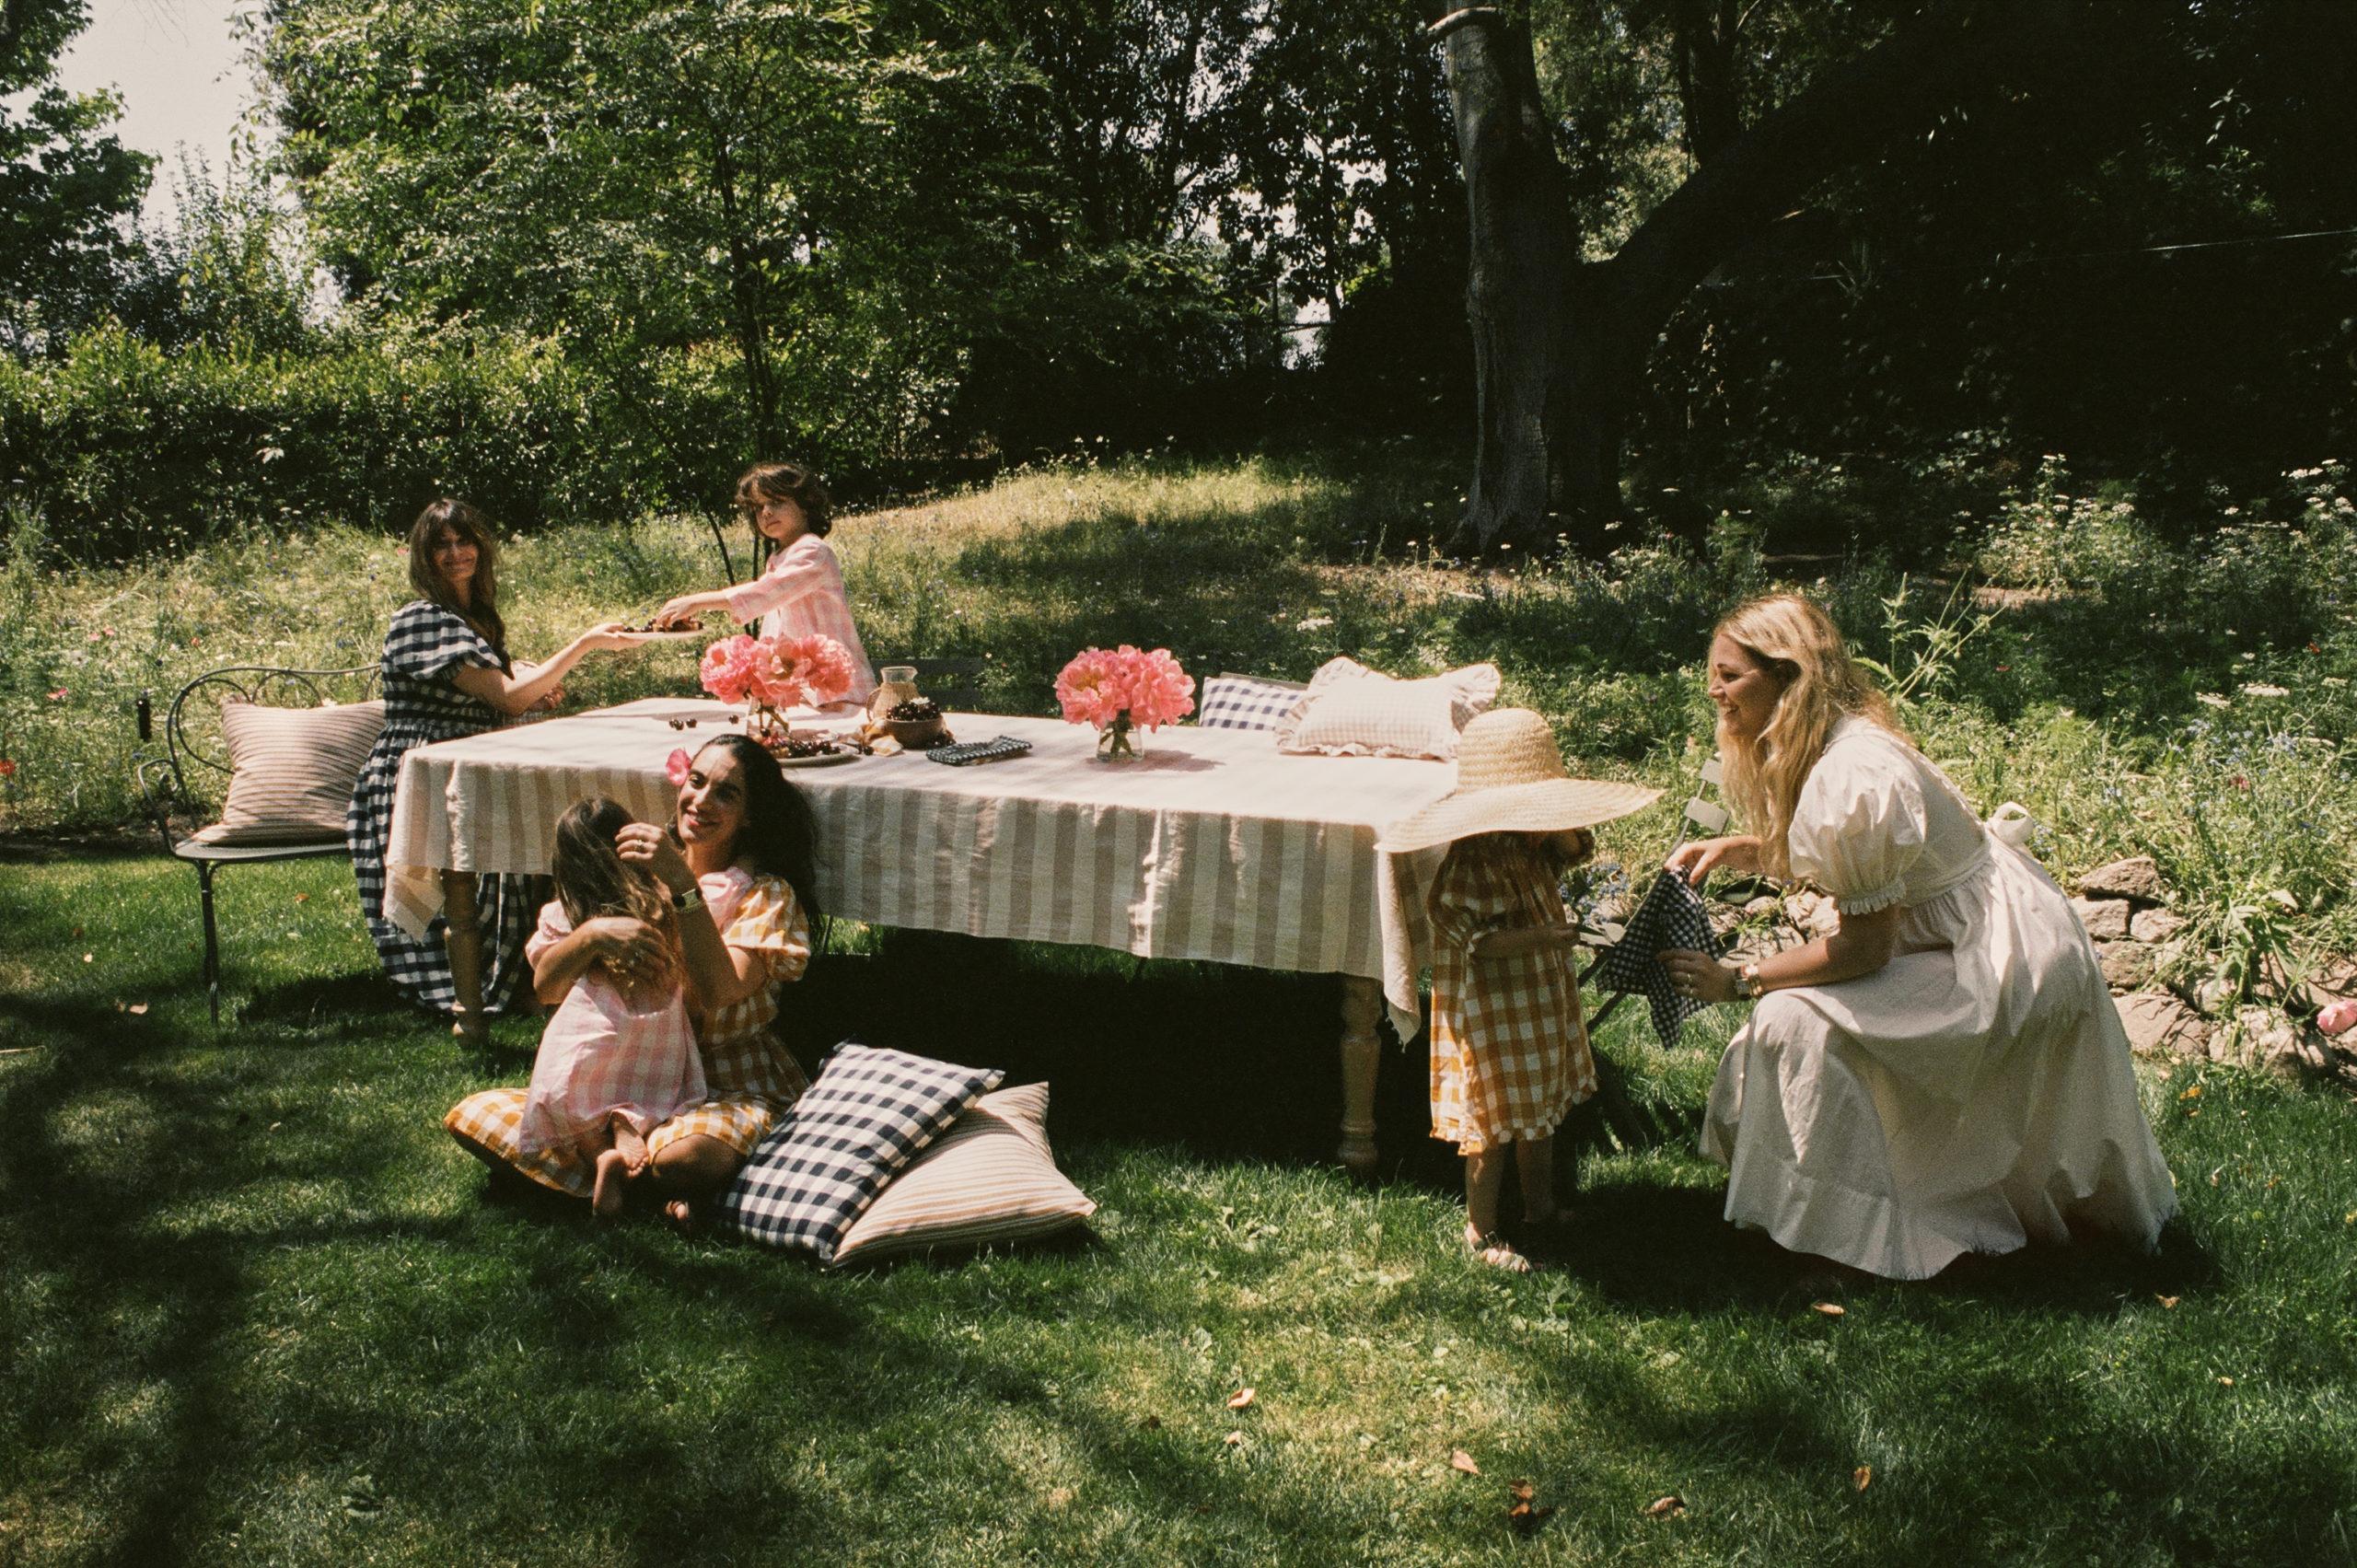 Doen Tablecloth pic